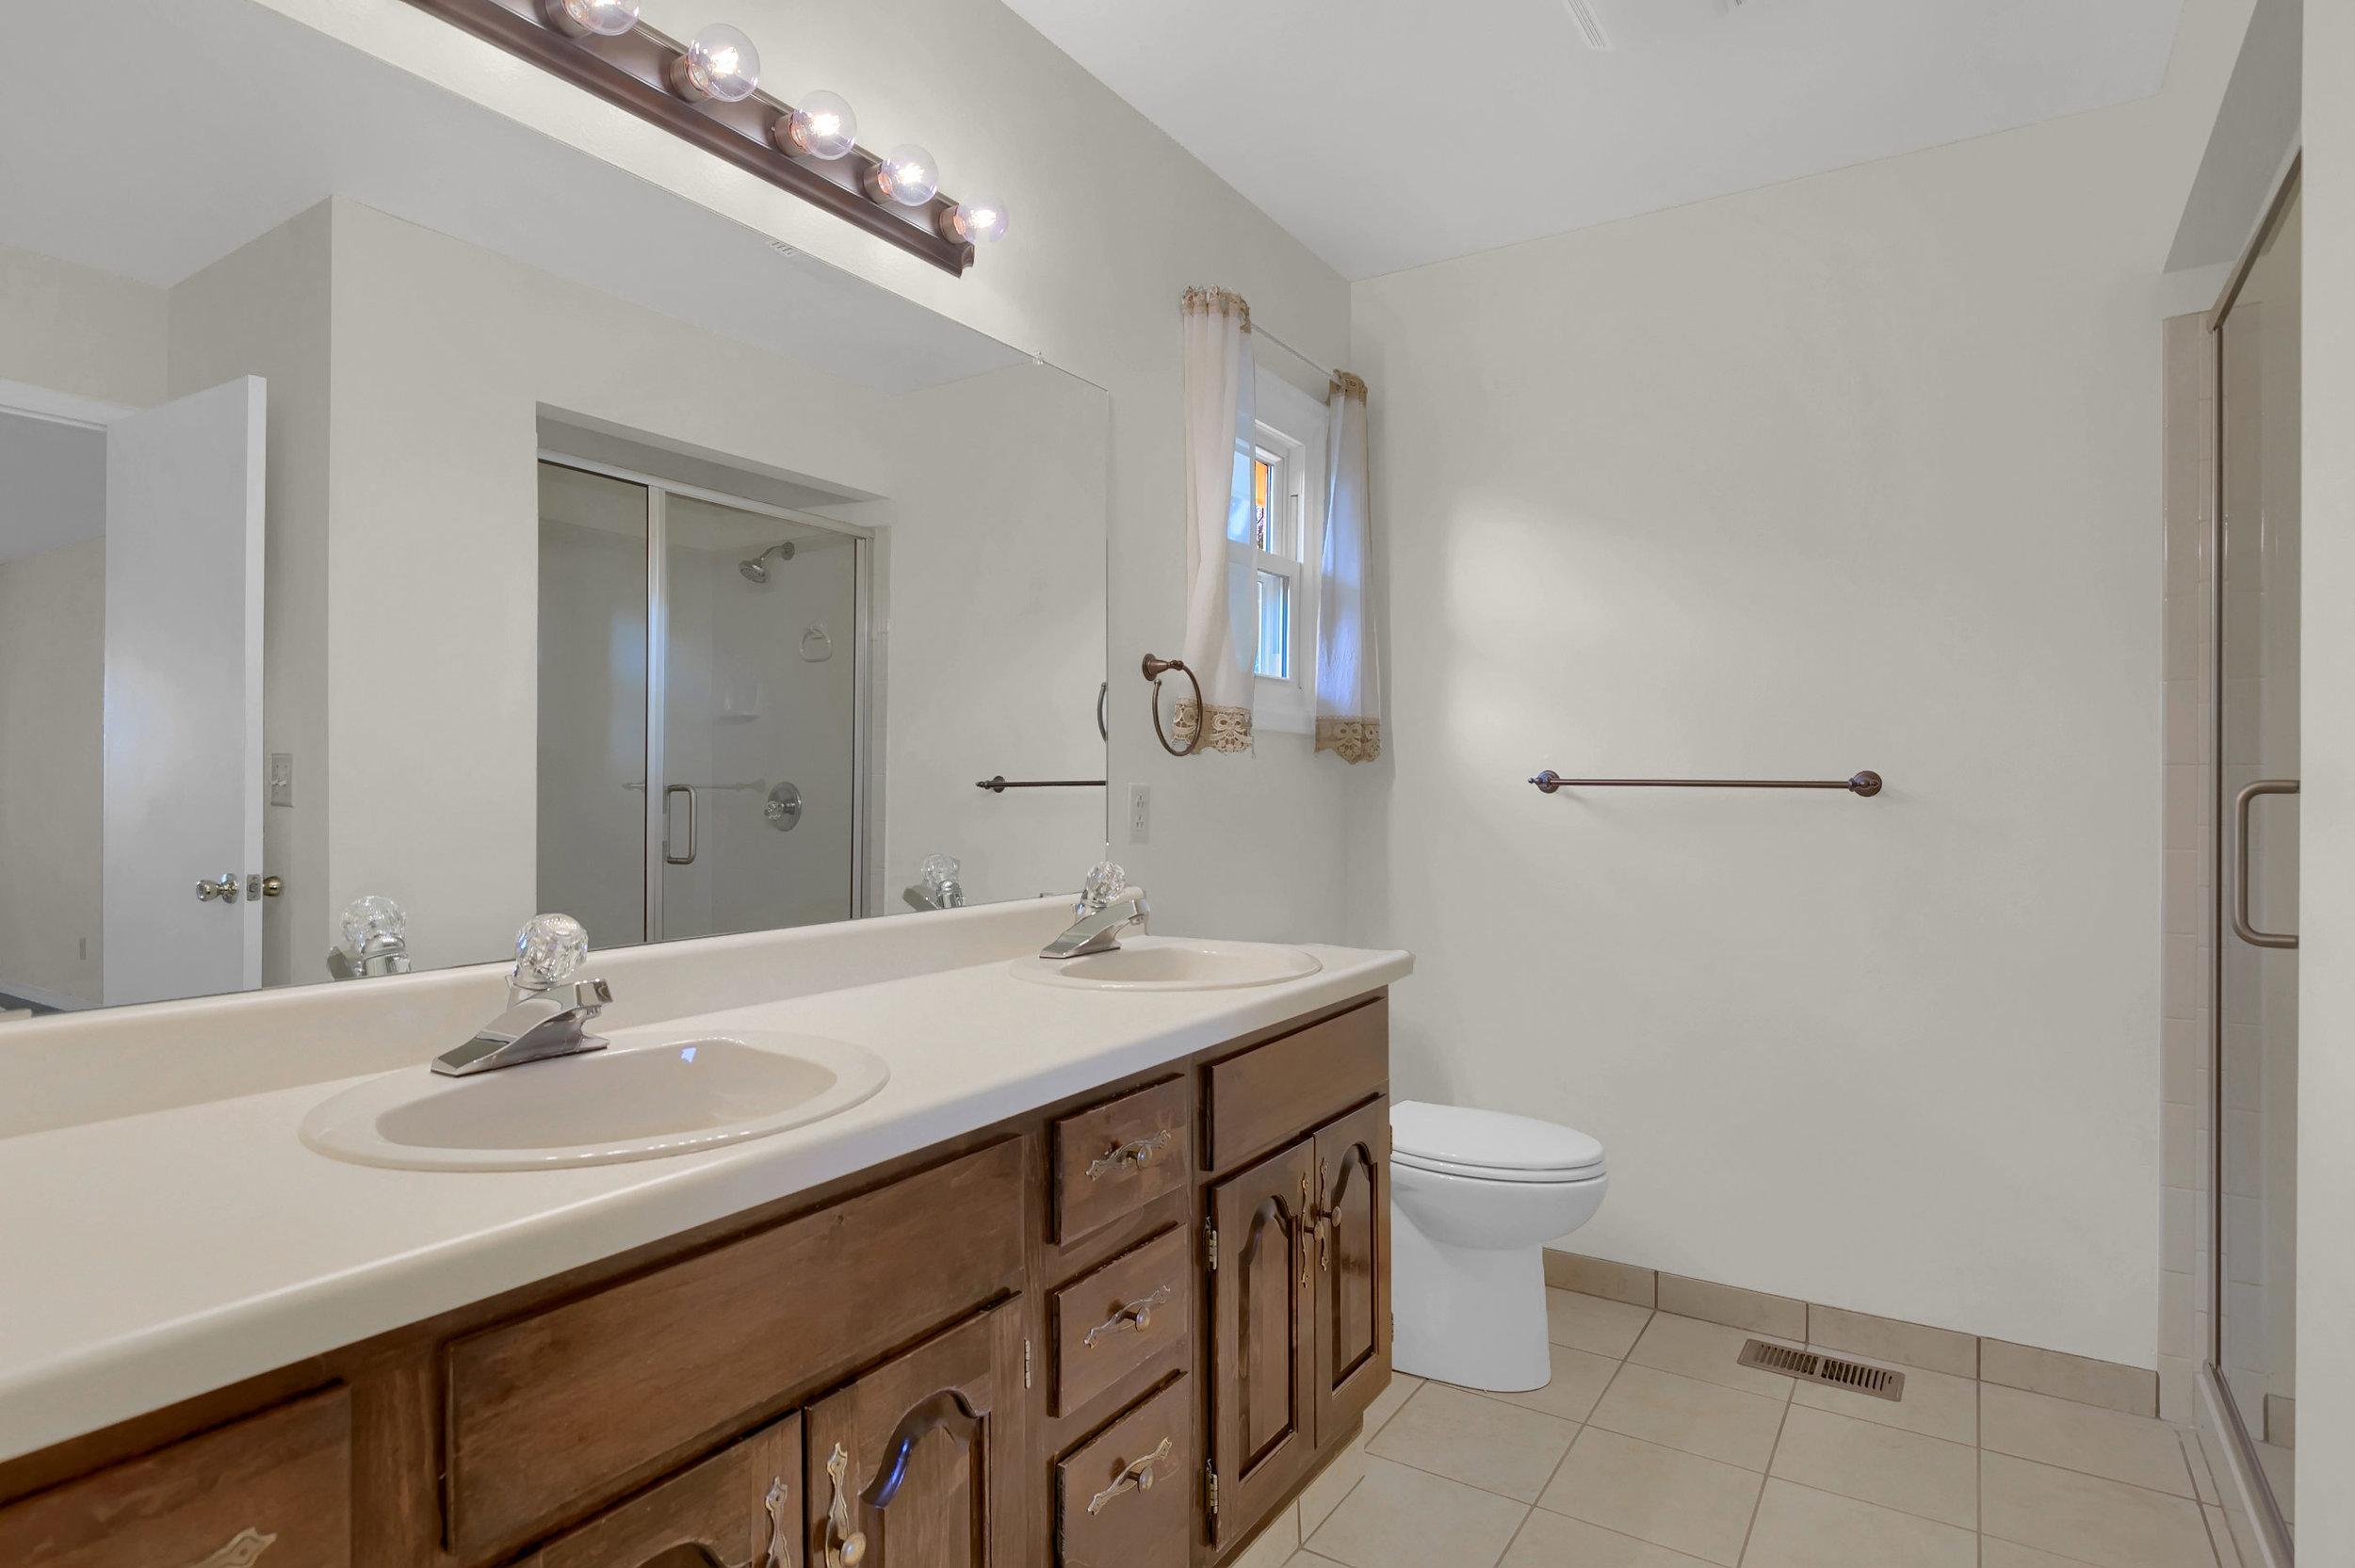 4215 Stonehaven Dr Colorado-print-032-029-Bathroom-2800x1865-300dpi.jpg